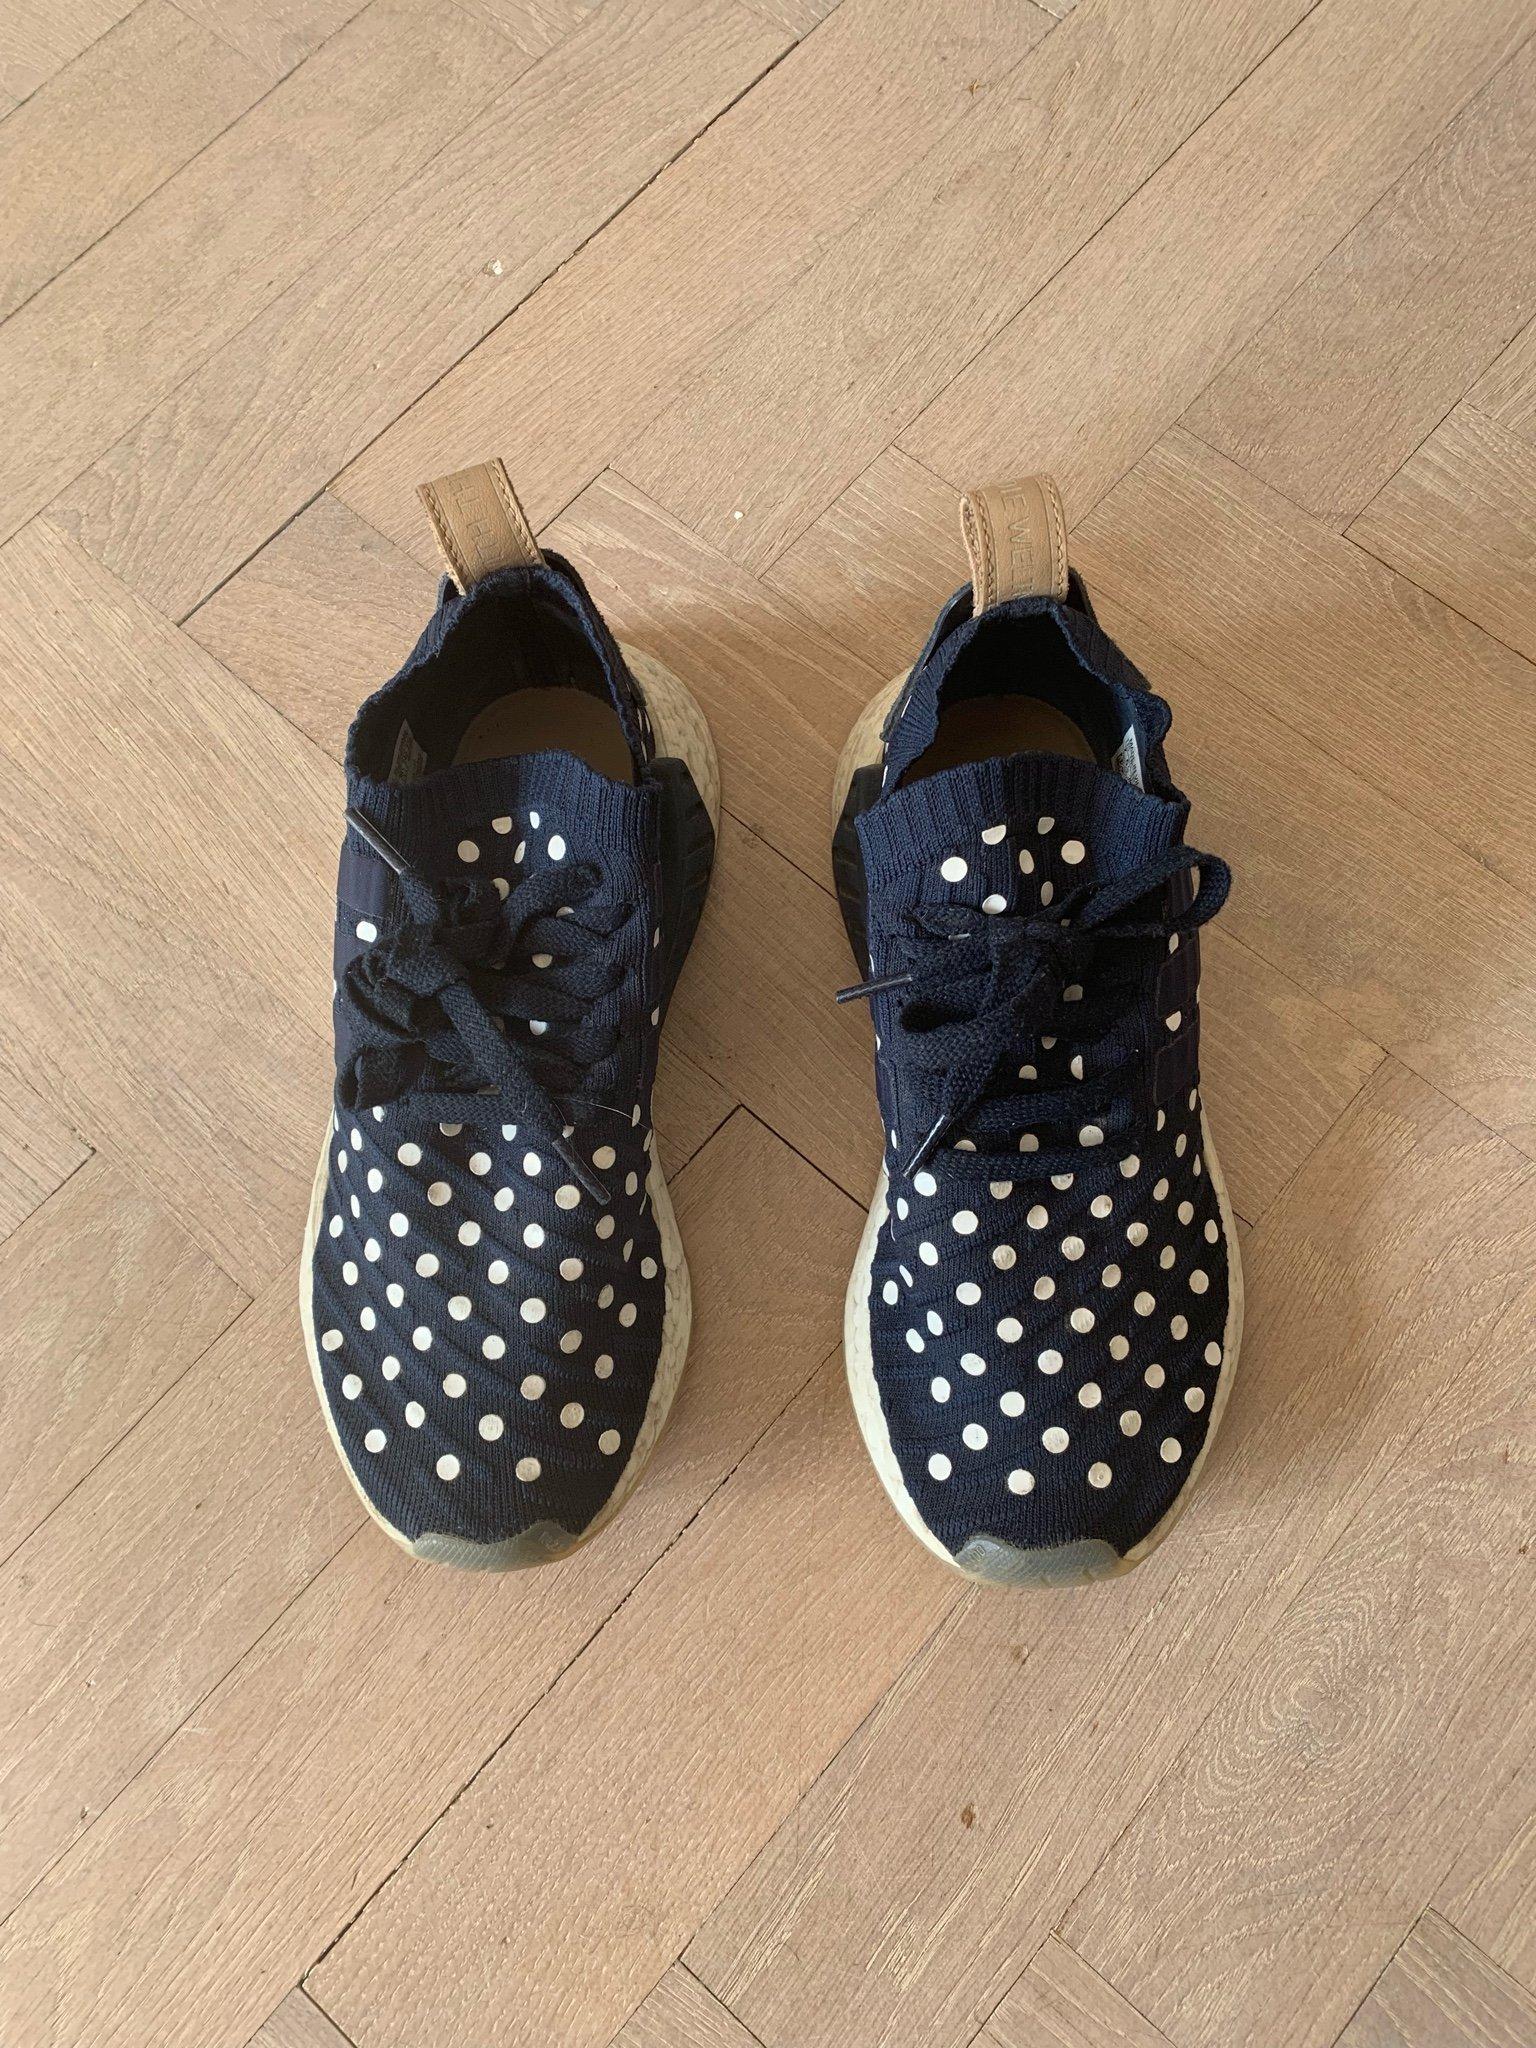 new style b2299 e0e09 Adidas sneakers Nmd storlek 38 2 3